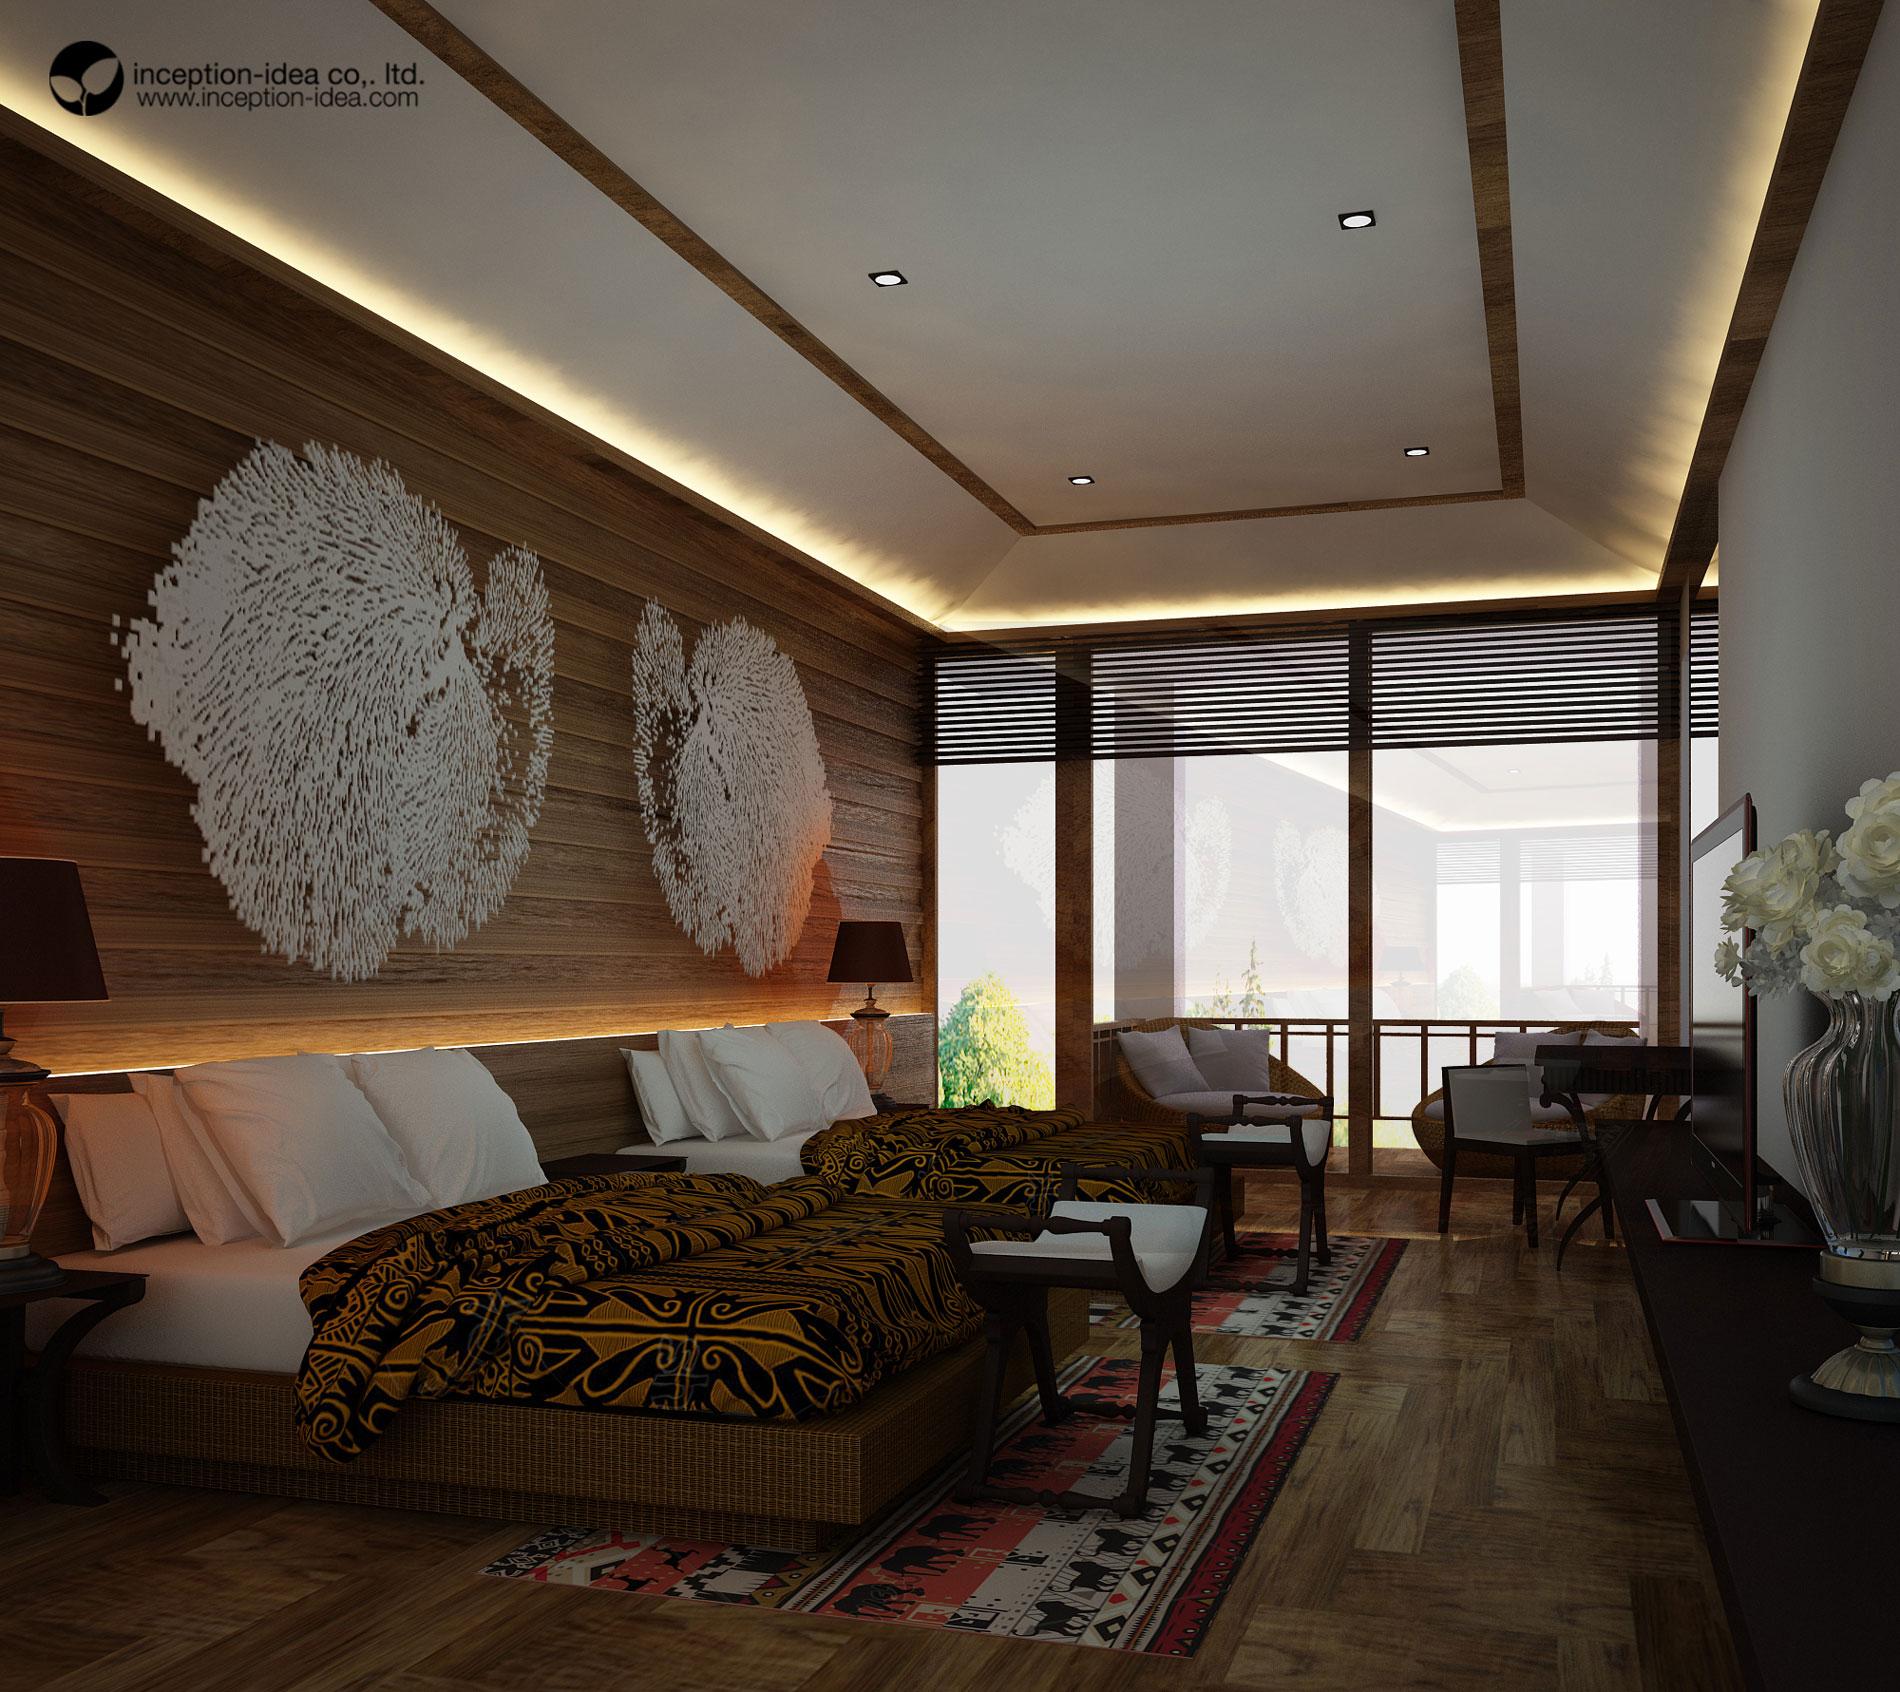 Inception Idea interior design